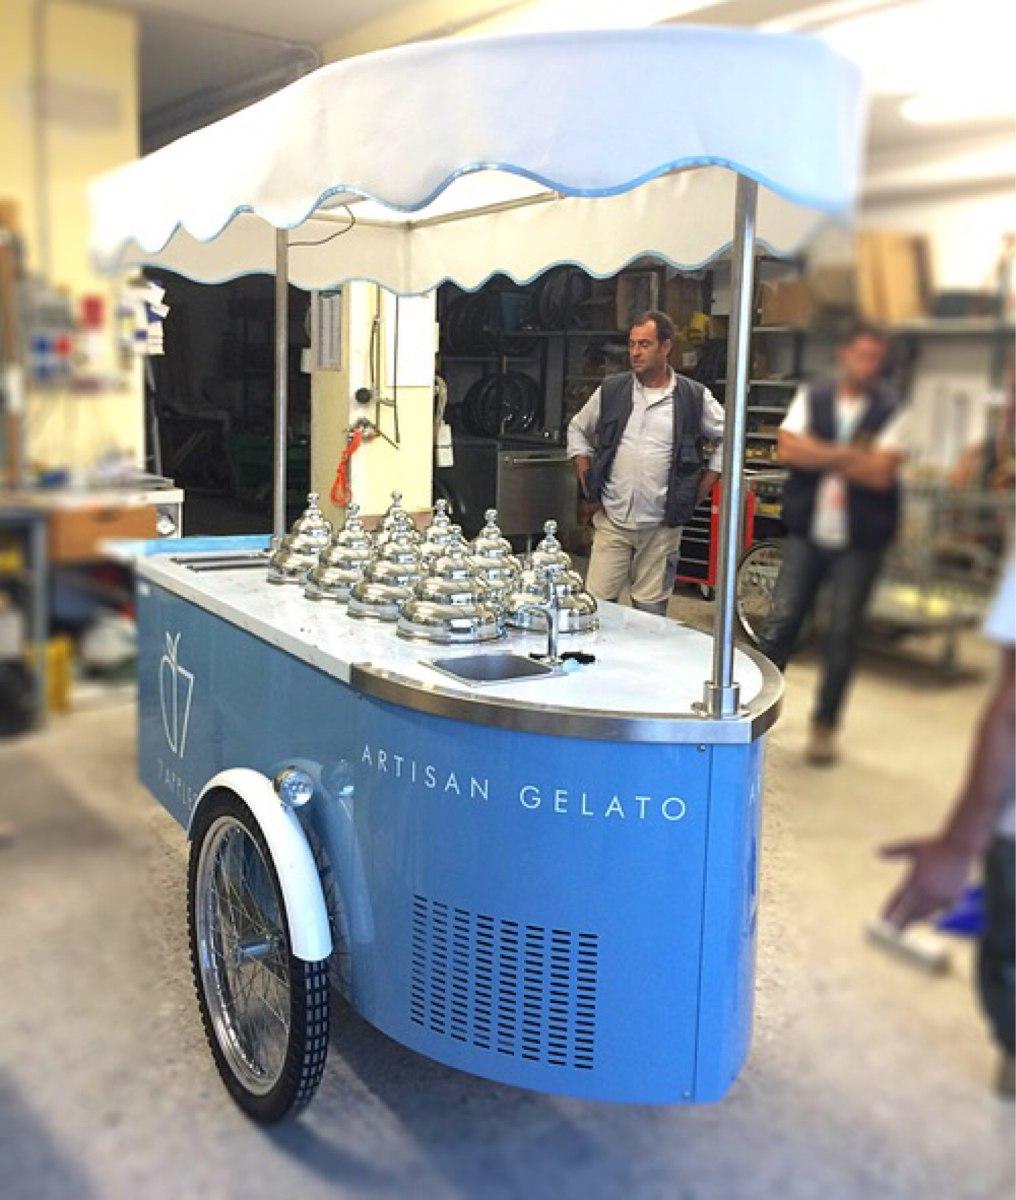 Carritos helado y paletas 35 en mercado libre for Carritos con ruedas para cocina